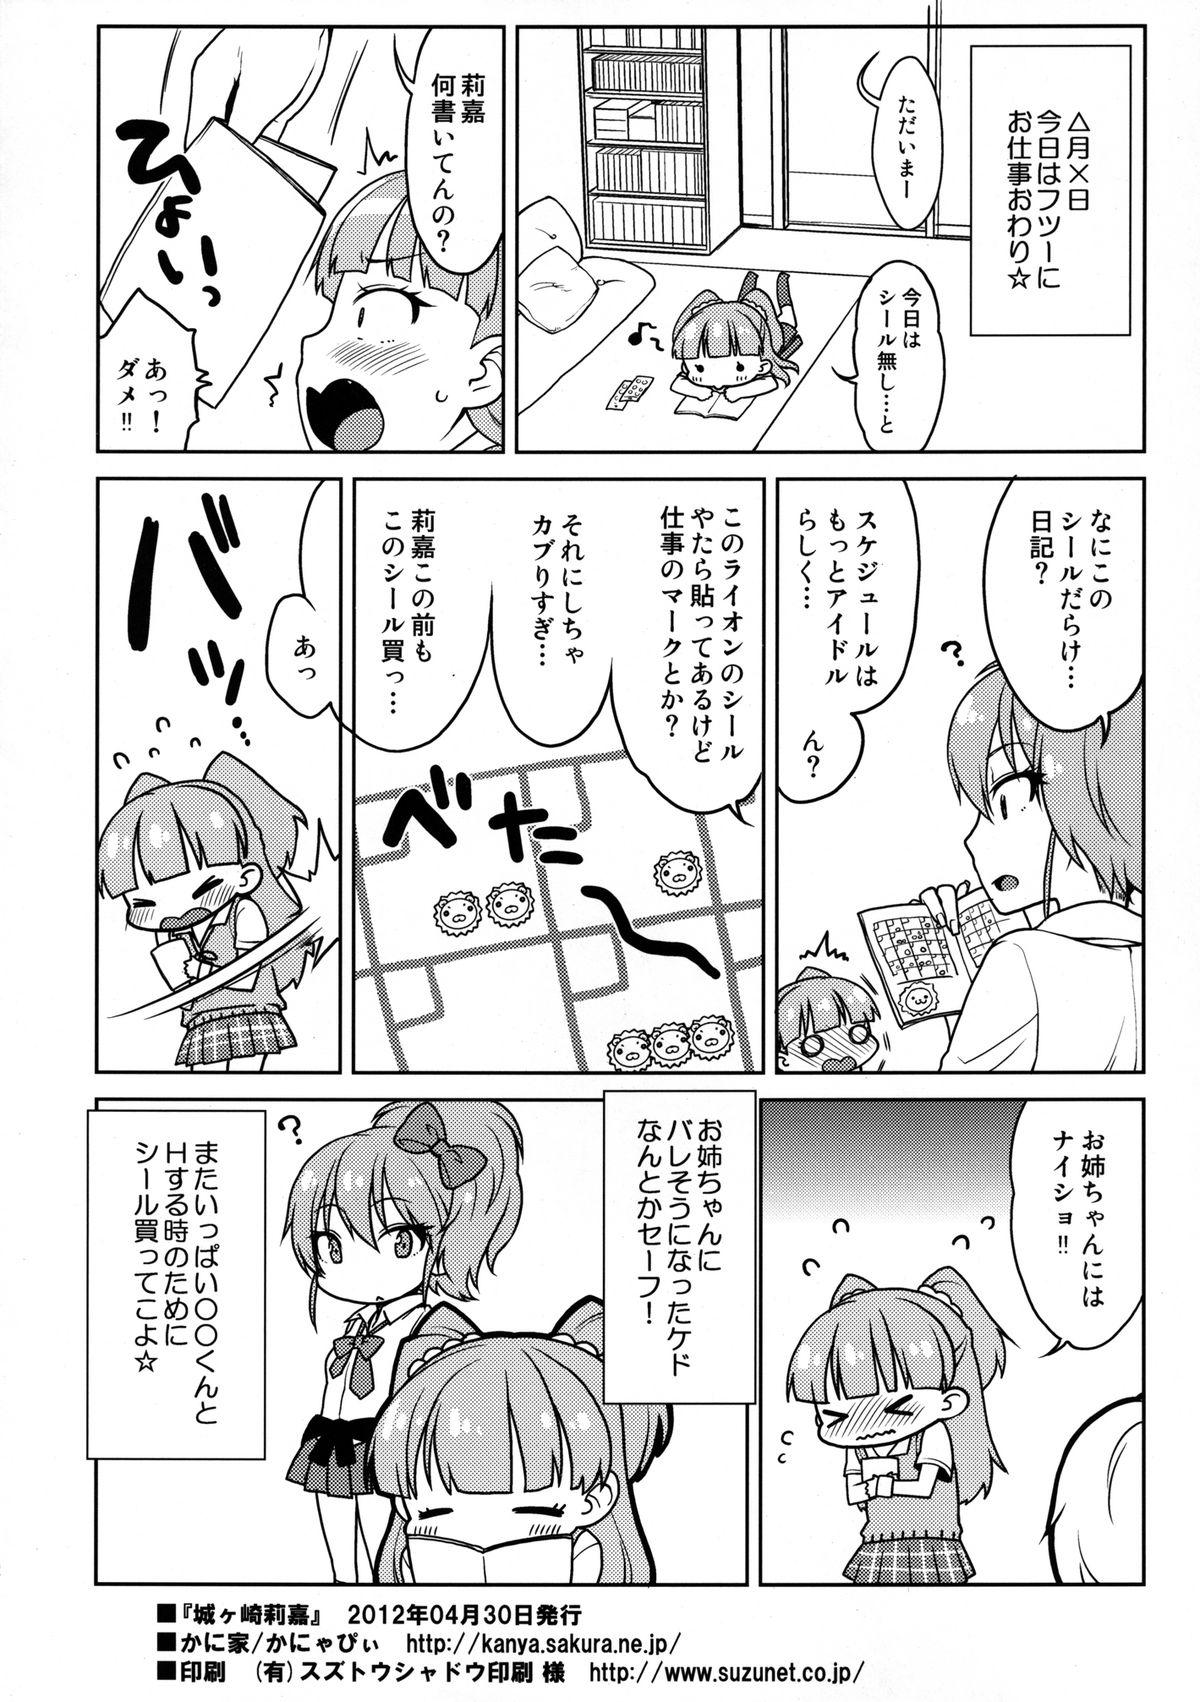 Rika-chan Kawaii 20